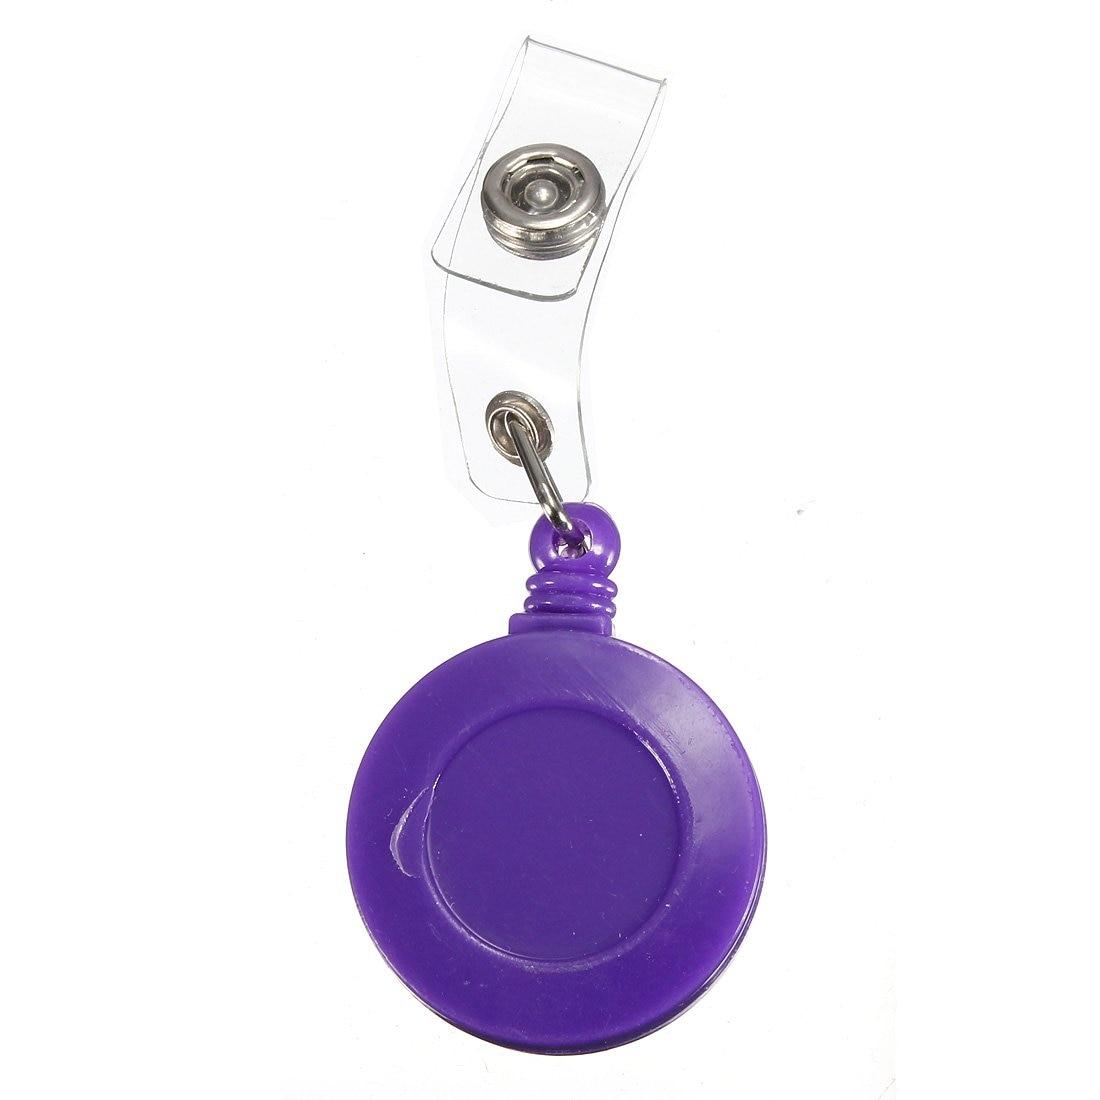 1 Pcs Badge Holder Retractable Reel YOYO Clip Snap Button ID Card Key Purple